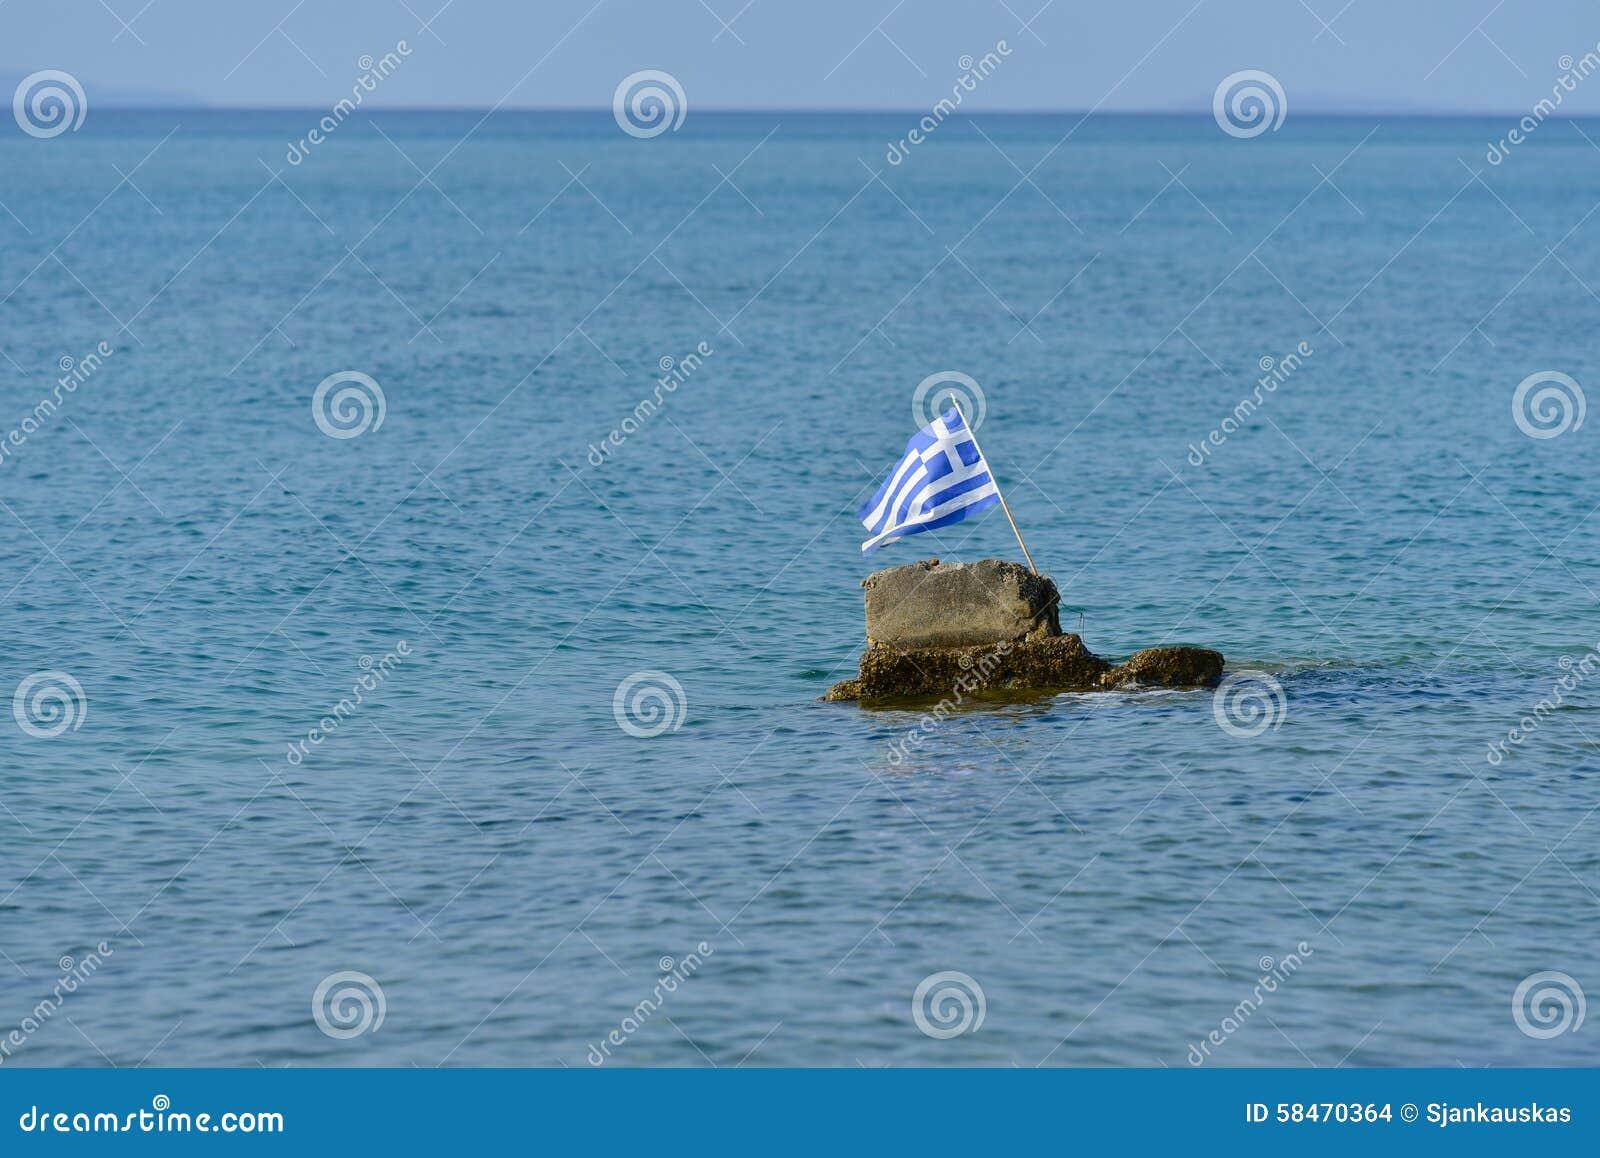 Greece flag in Aegean sea